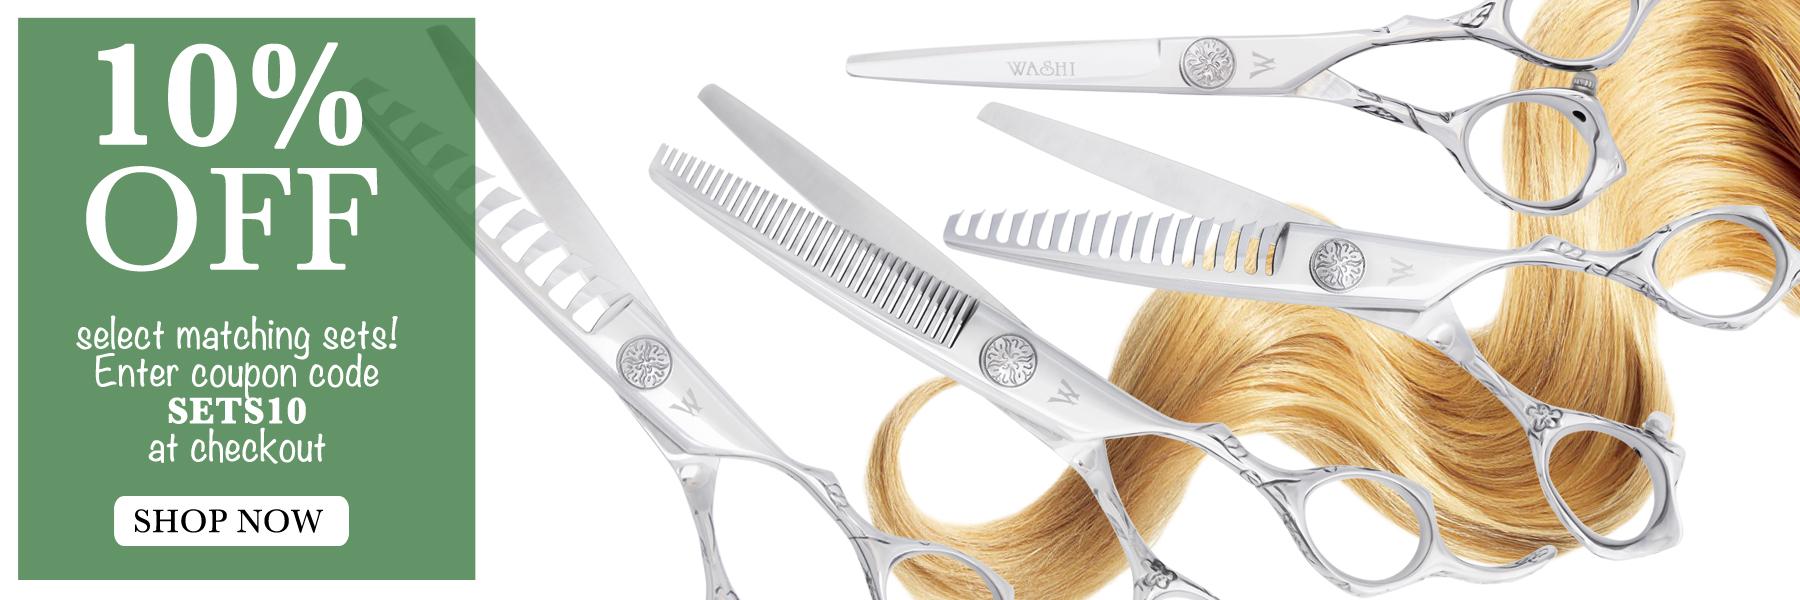 10% off matching hair cutting shear sets